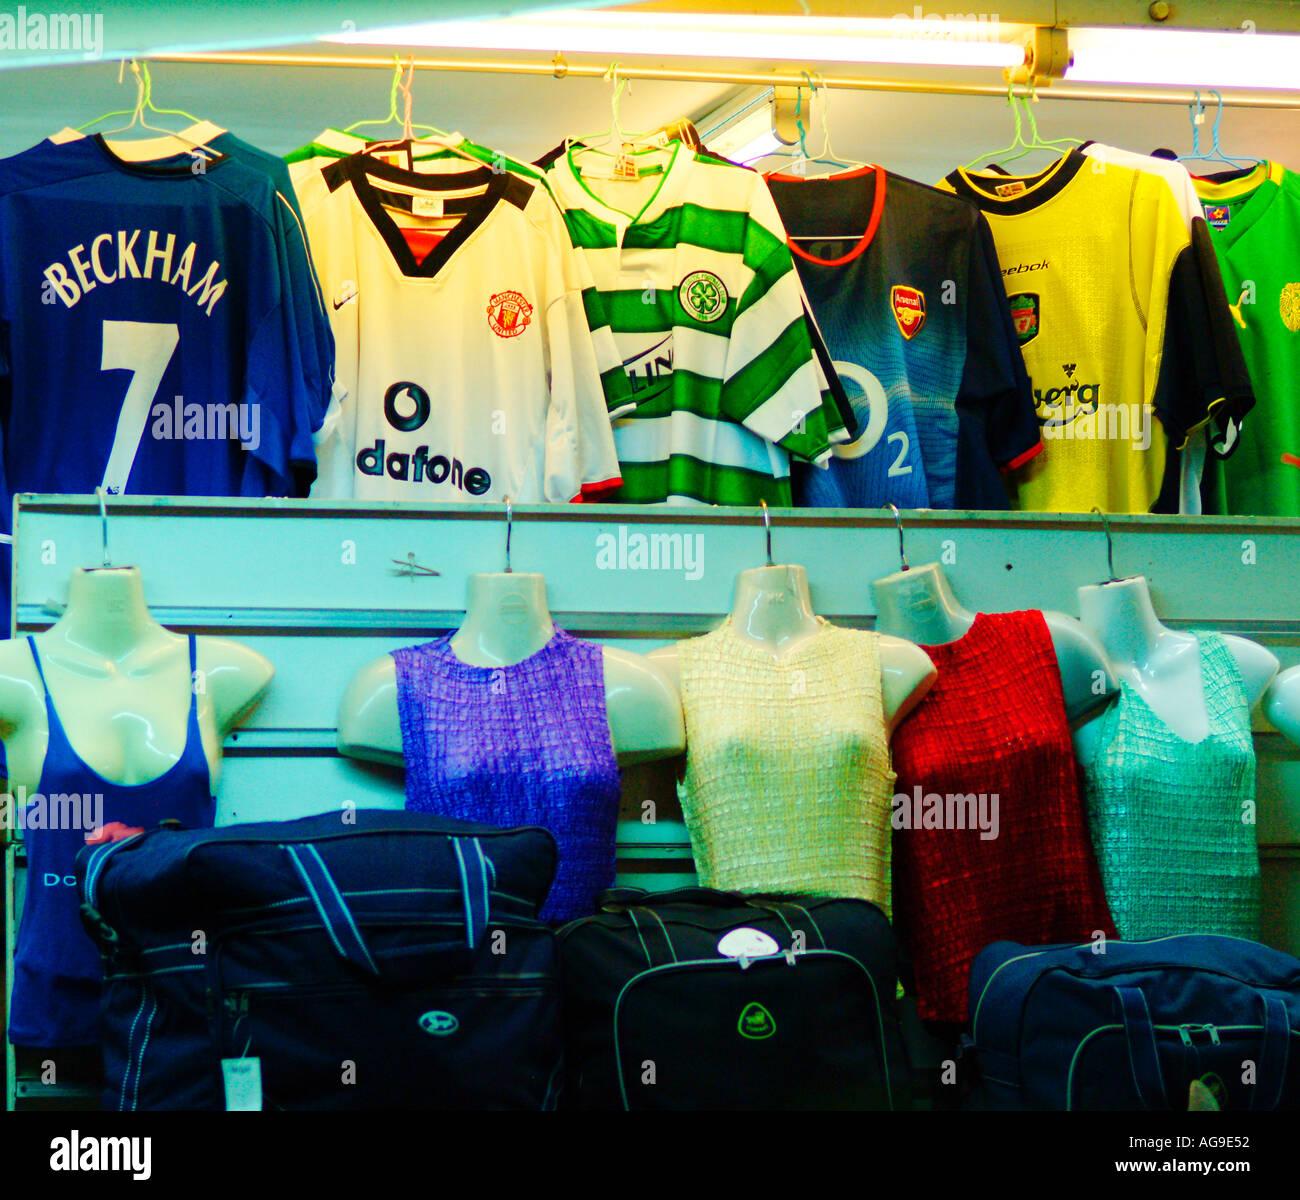 newest 7fda6 3b051 Counterfeit Soccer Kits Stock Photos & Counterfeit Soccer ...